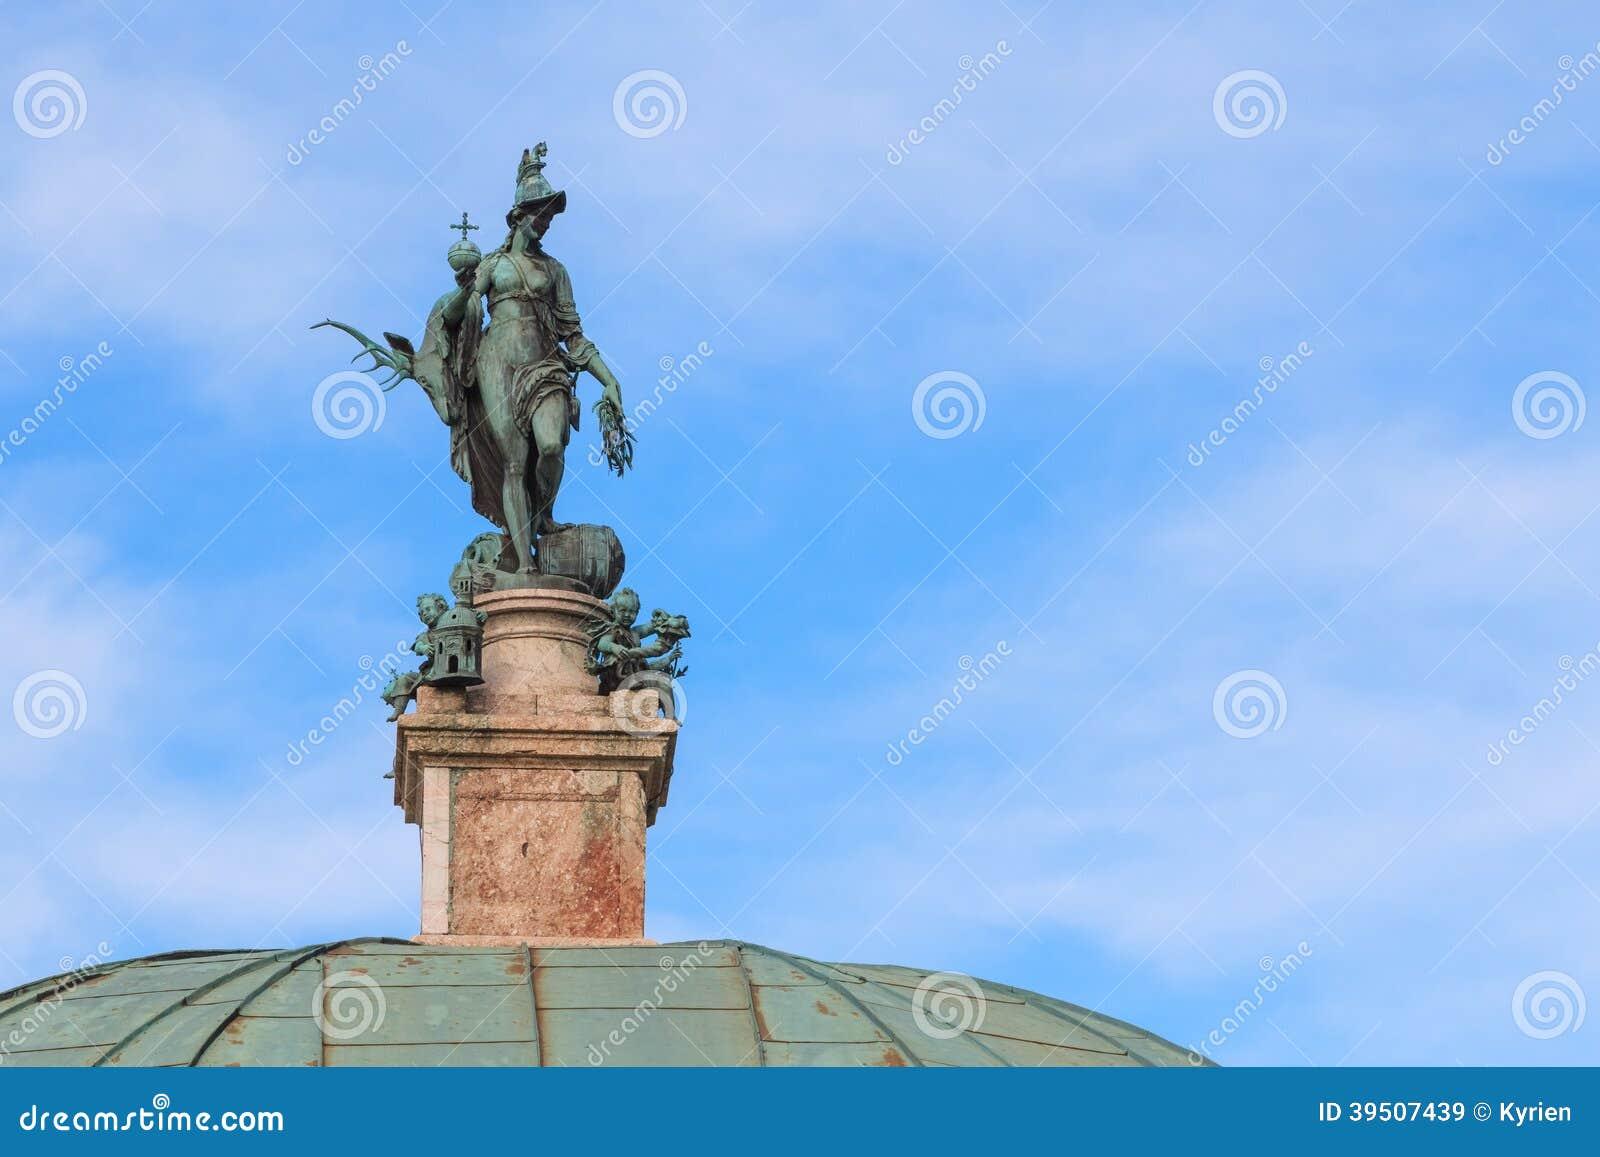 Statue of the goddess of hunt, Diana in Hofgarten, Munich